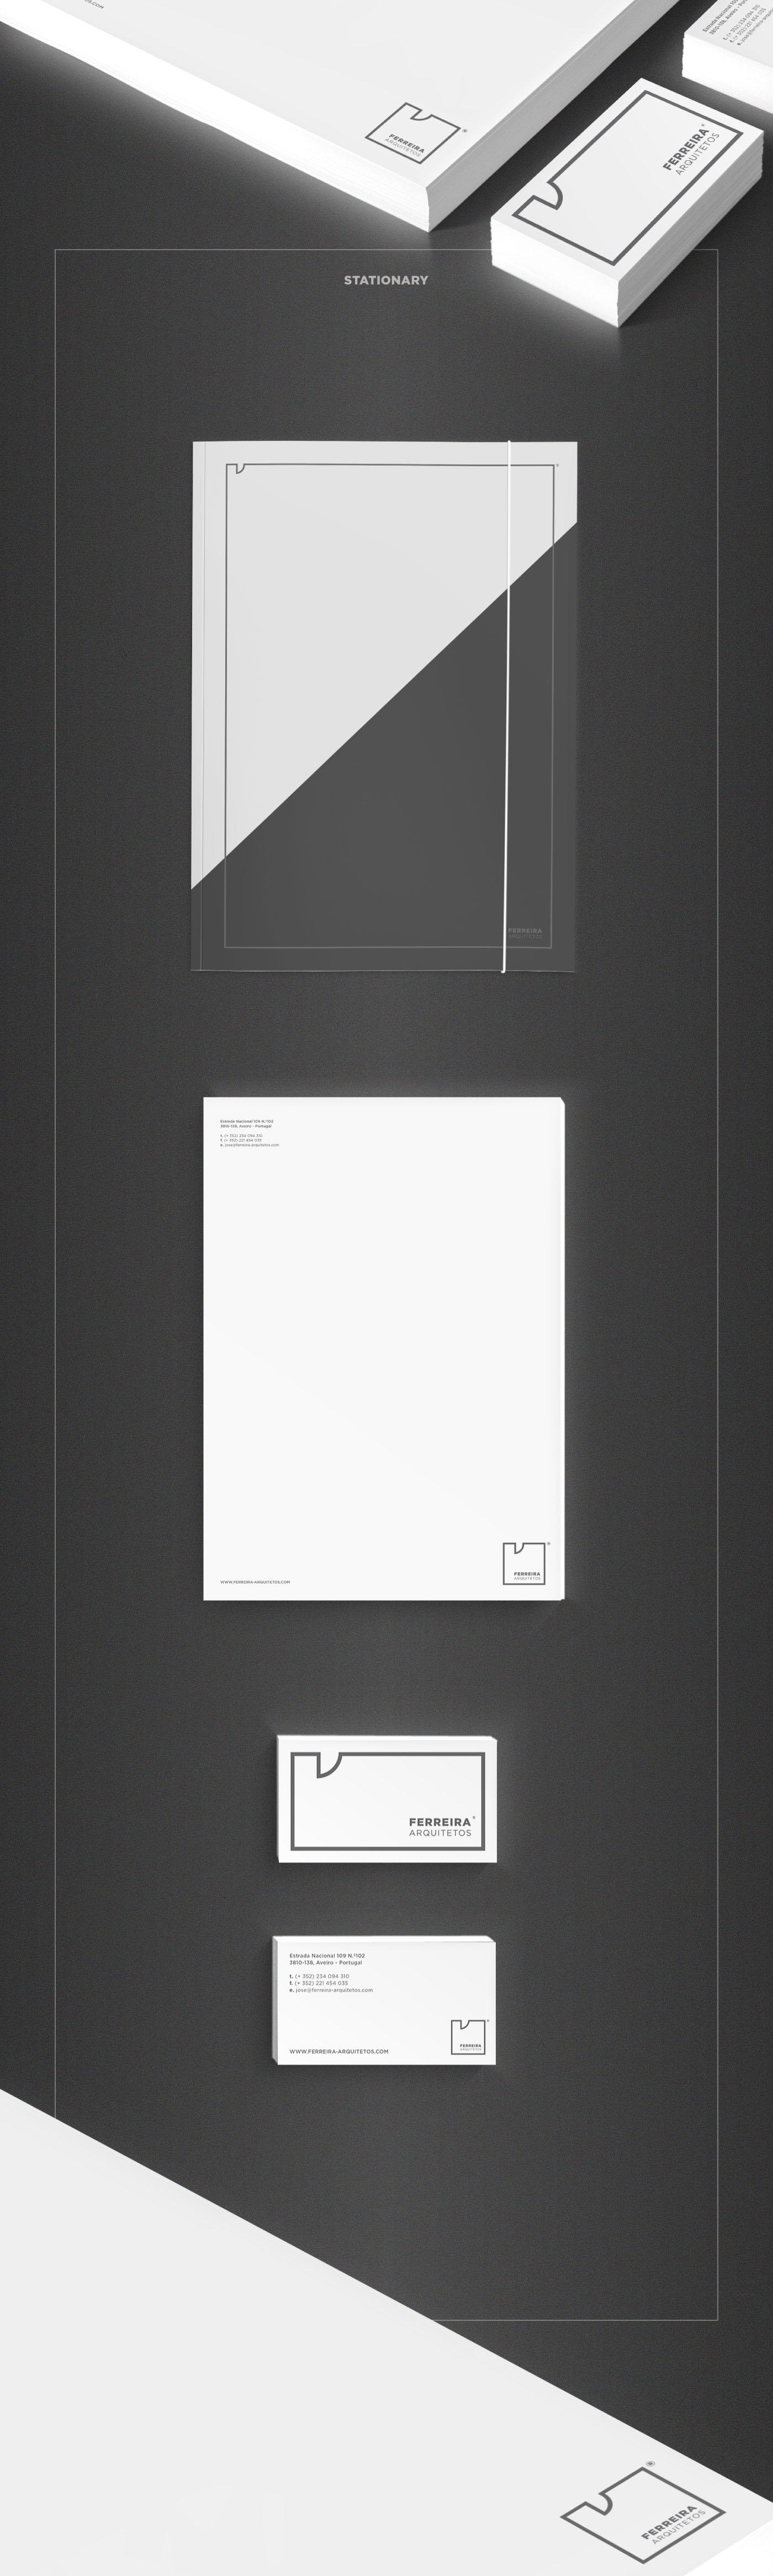 arquitetos ferreira black White grey cement blueprints architects door box